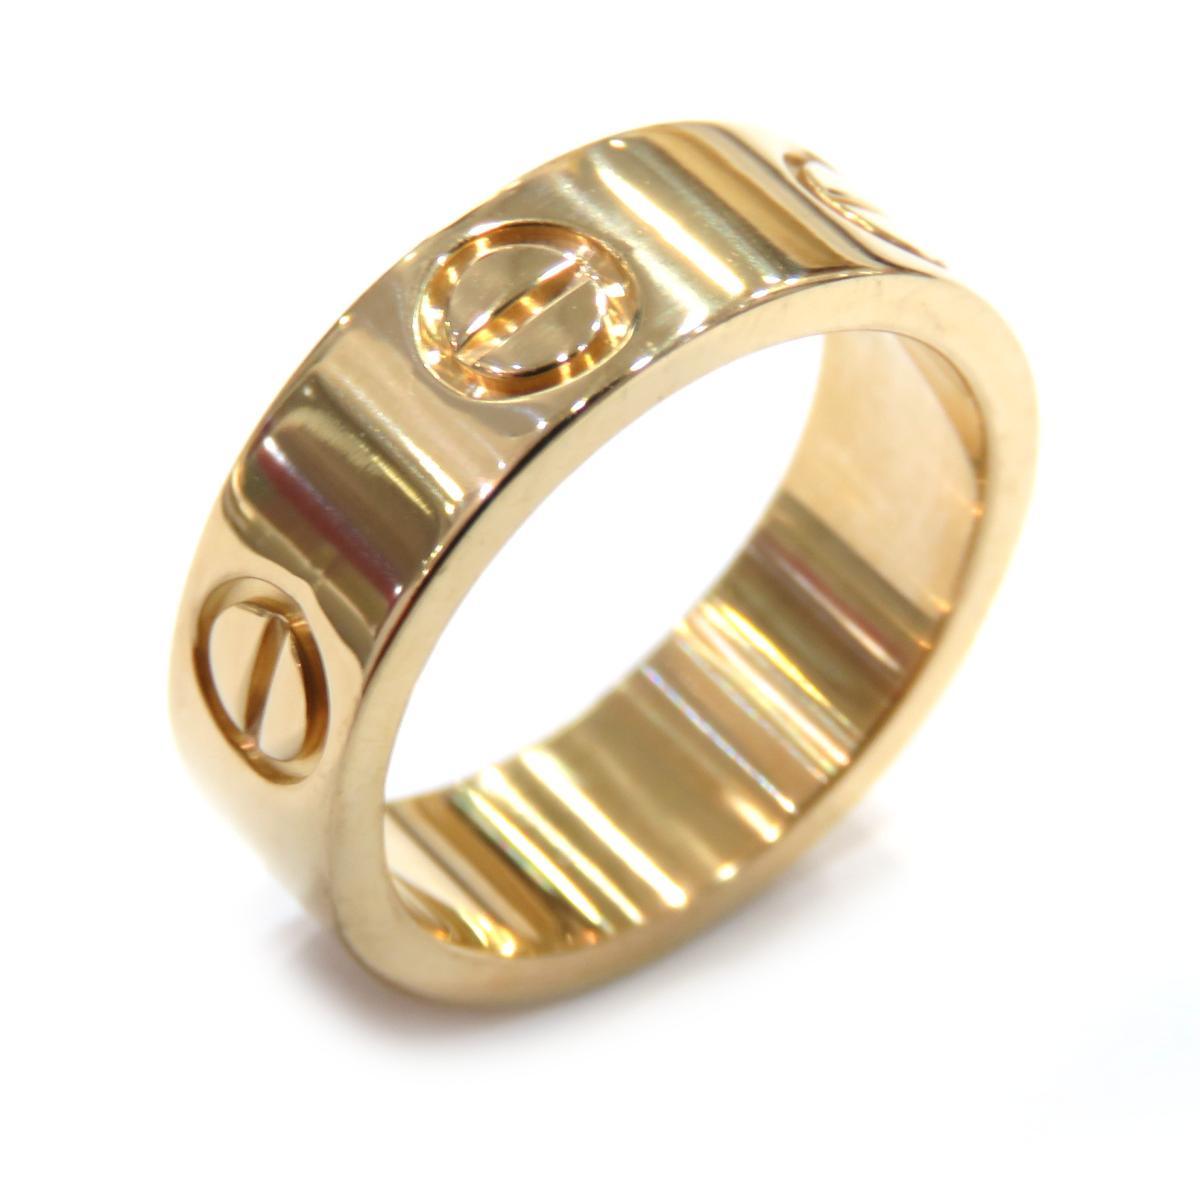 Cartier ラブリング 指輪 レディース ランクA 送料無料 プレゼント ギフト 交換無料 ラッピング無料 リング 流行 K18YG カルティエ 750 イエローゴールド 7号 #47 中古 全品鑑定済